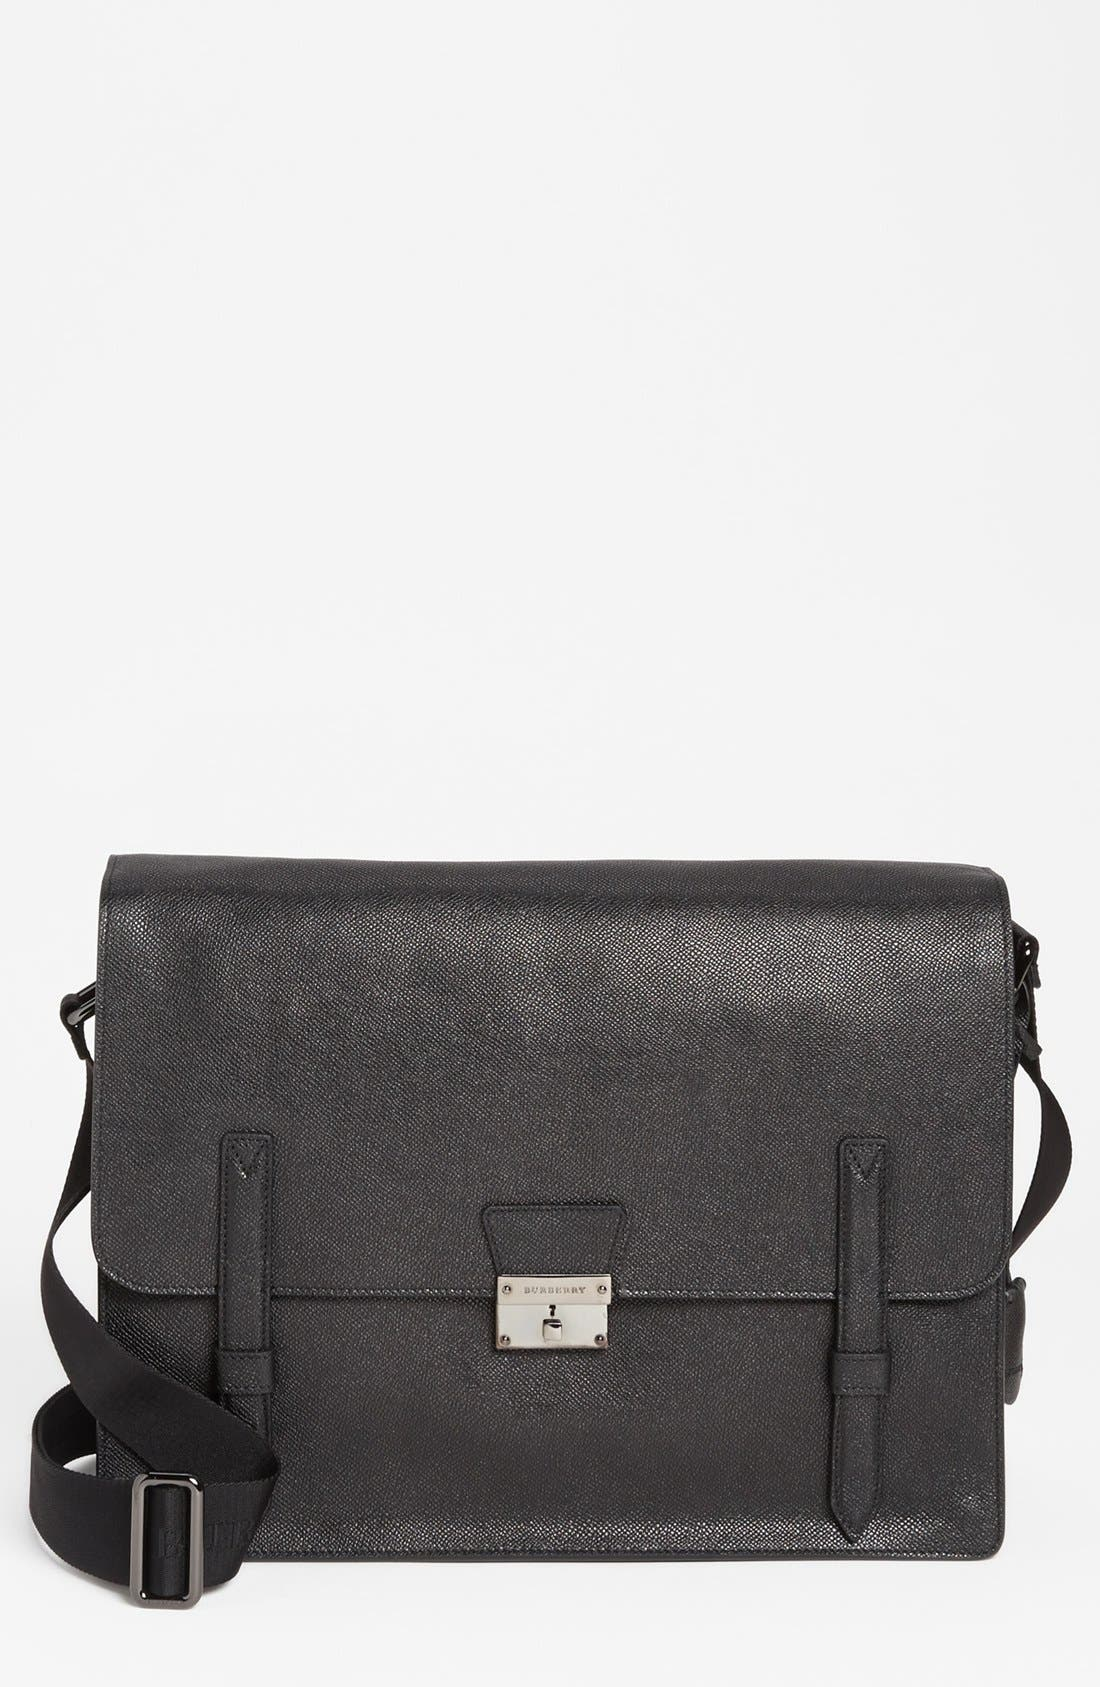 Main Image - Burberry 'Rivendale' Leather Messenger Bag